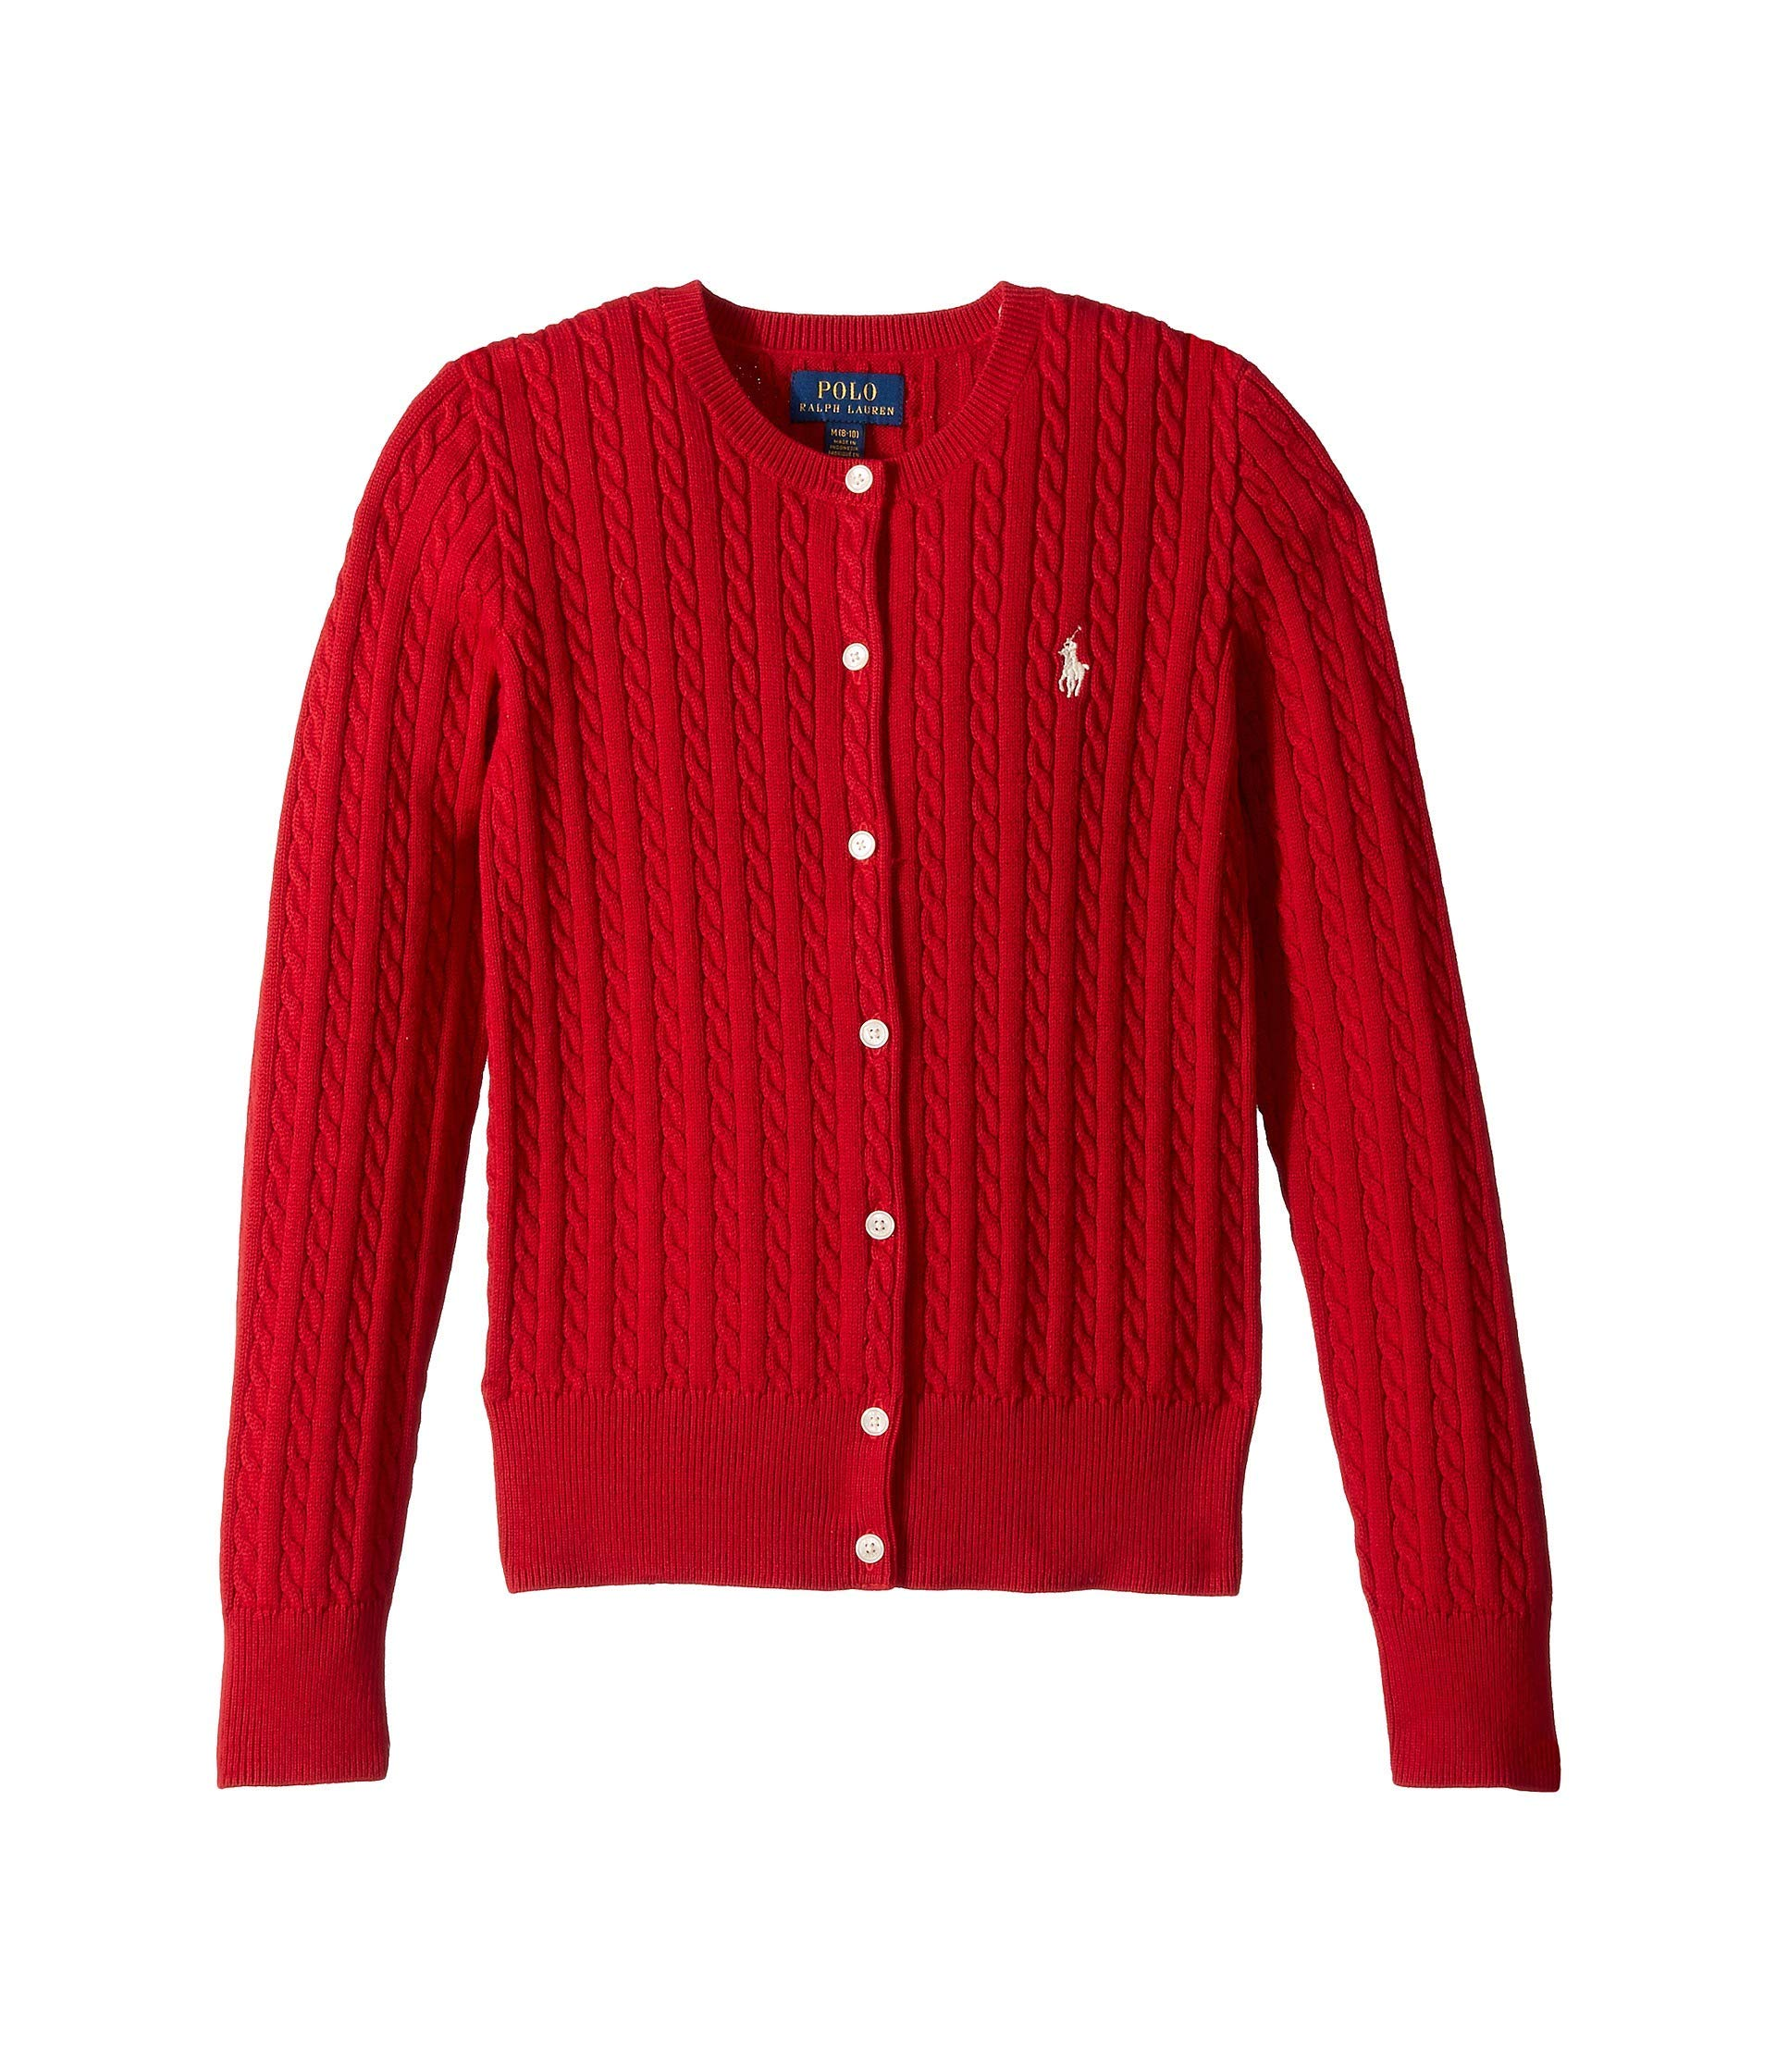 Ralph Lauren Girls Cable Knit Cotton Cardigan Size S, M (Red, Medium (8-10))